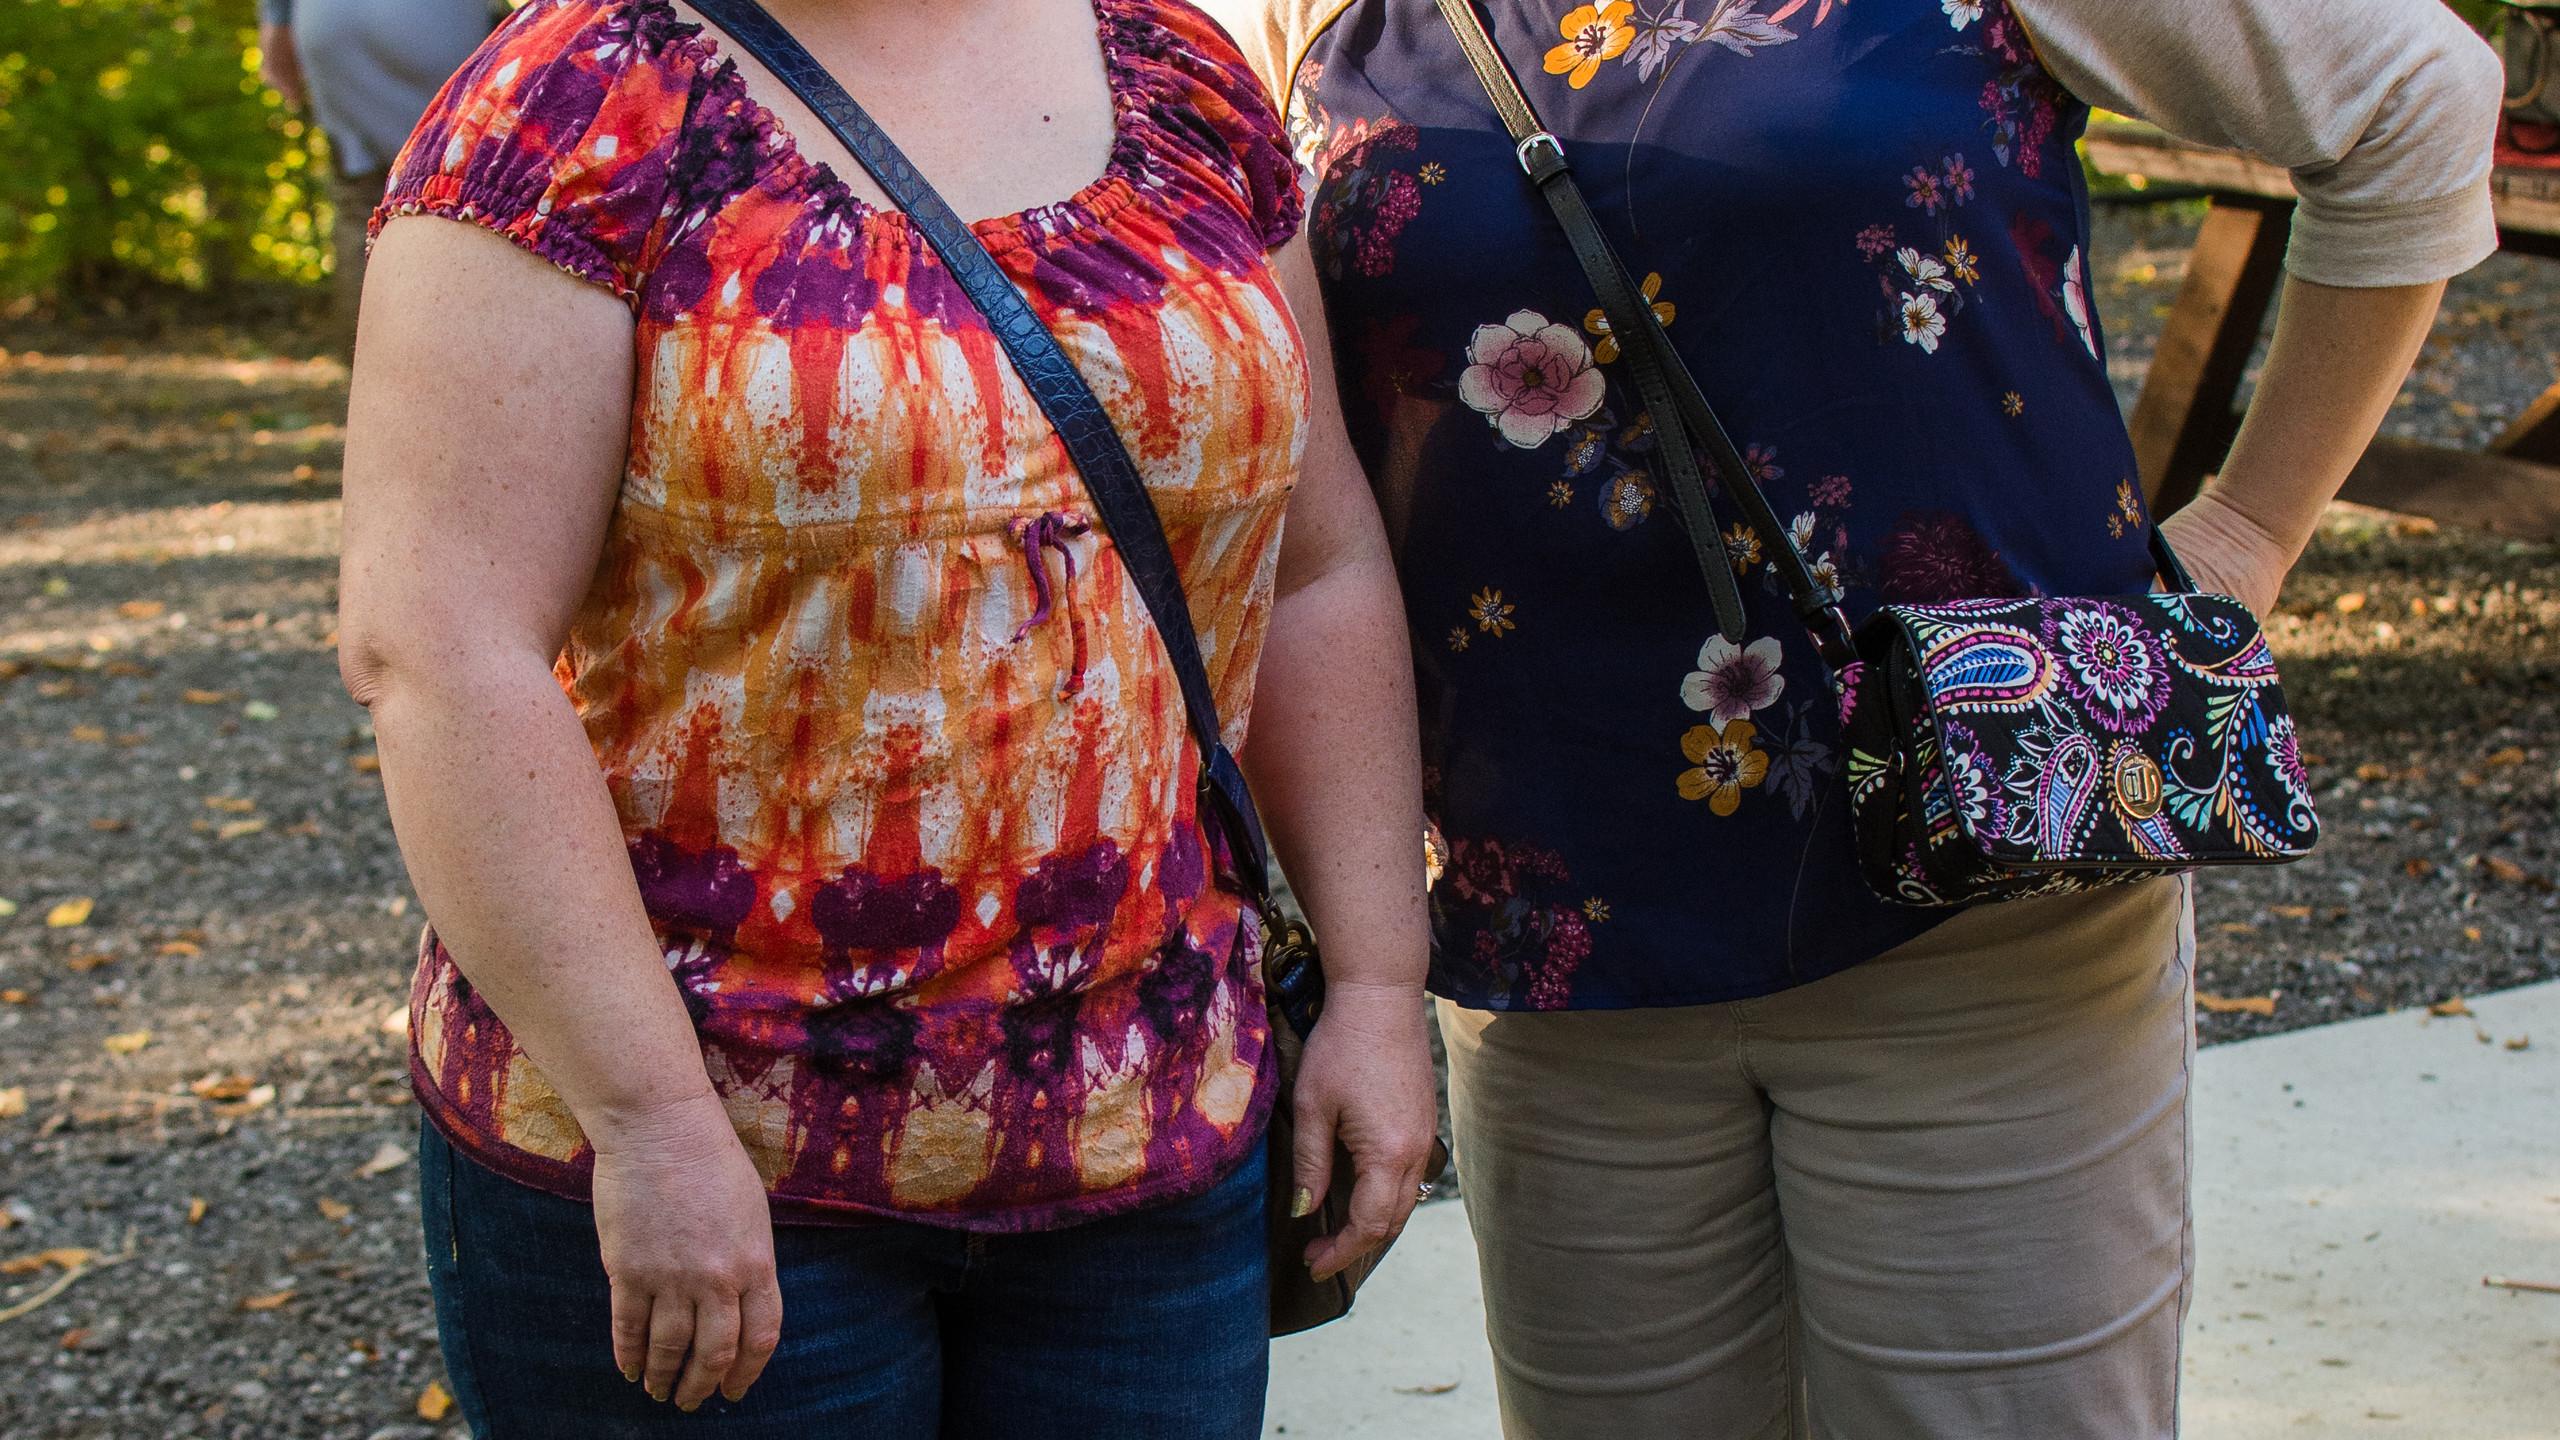 Christine Lindsey and Heather Ingram